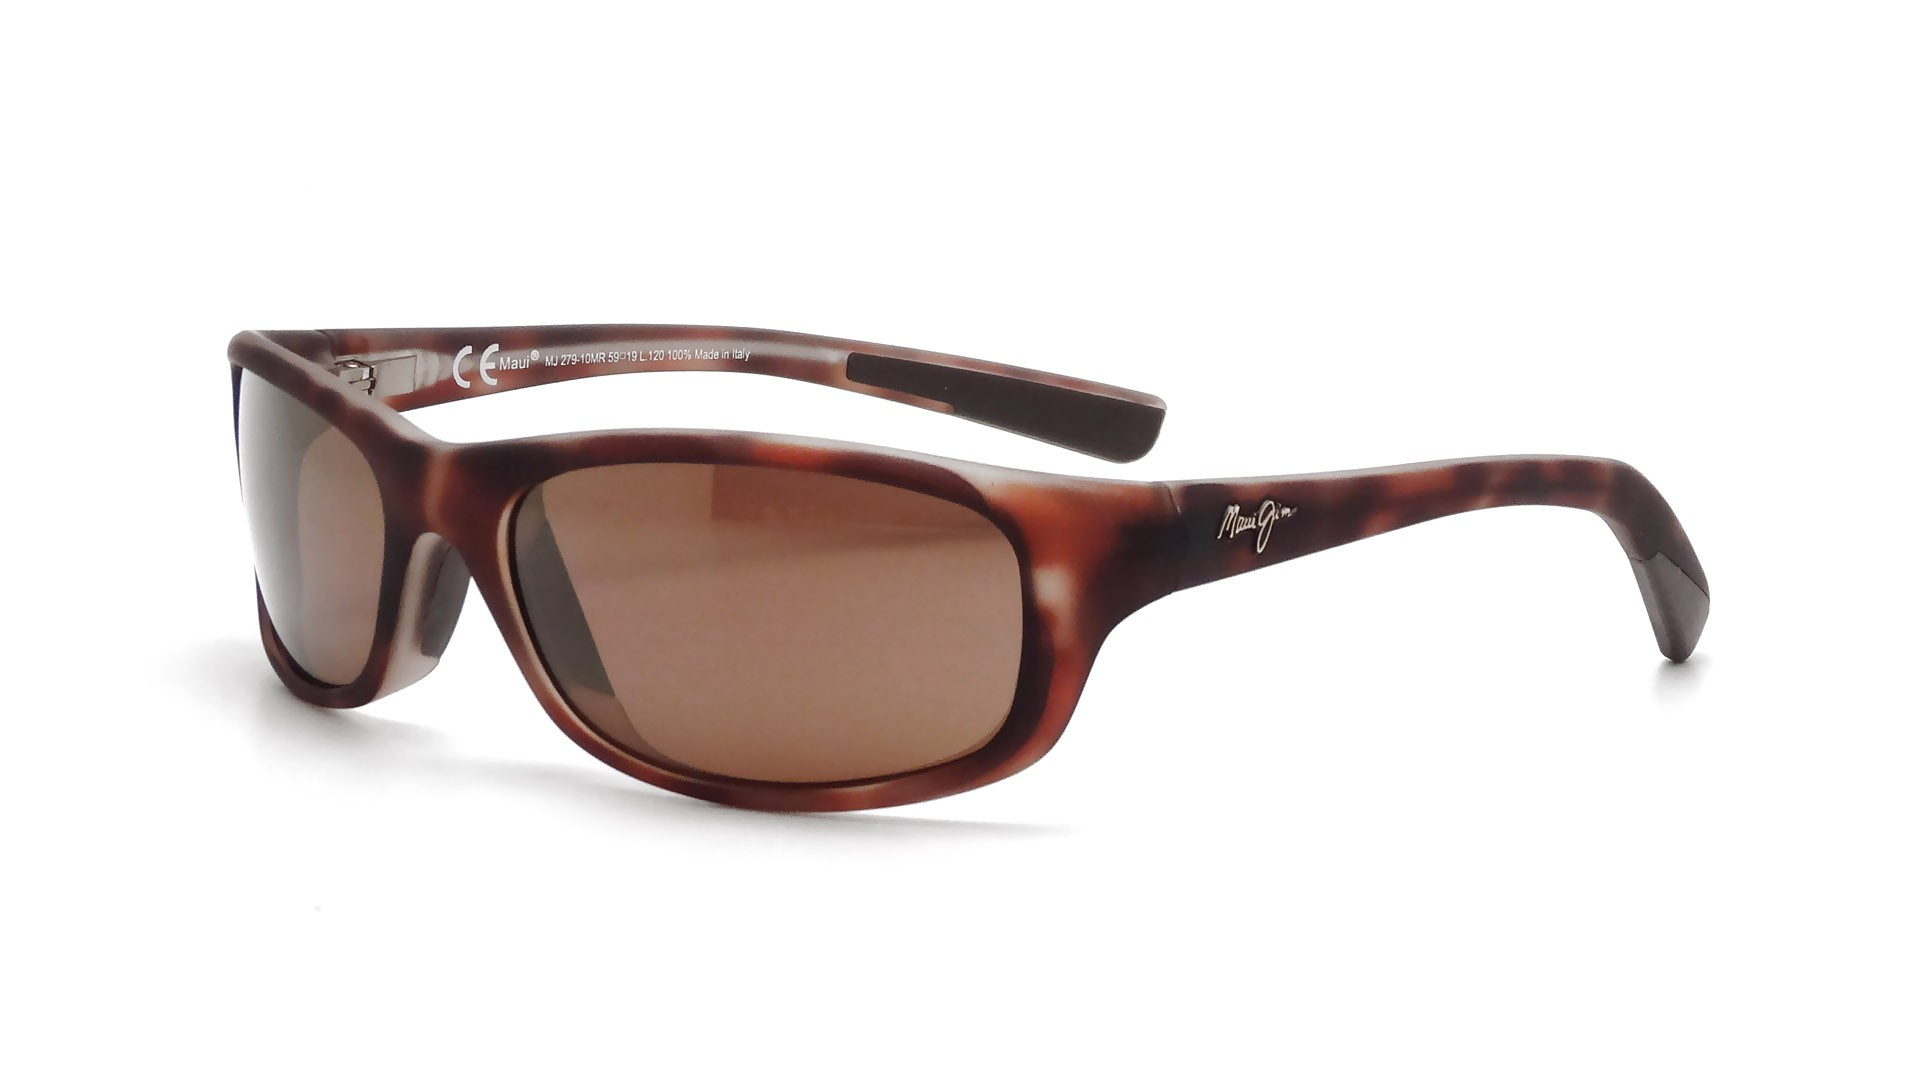 43d00338f3 Sunglasses Maui Jim Kipahulu Tortoise H279-10MR 59-19 Large Polarized